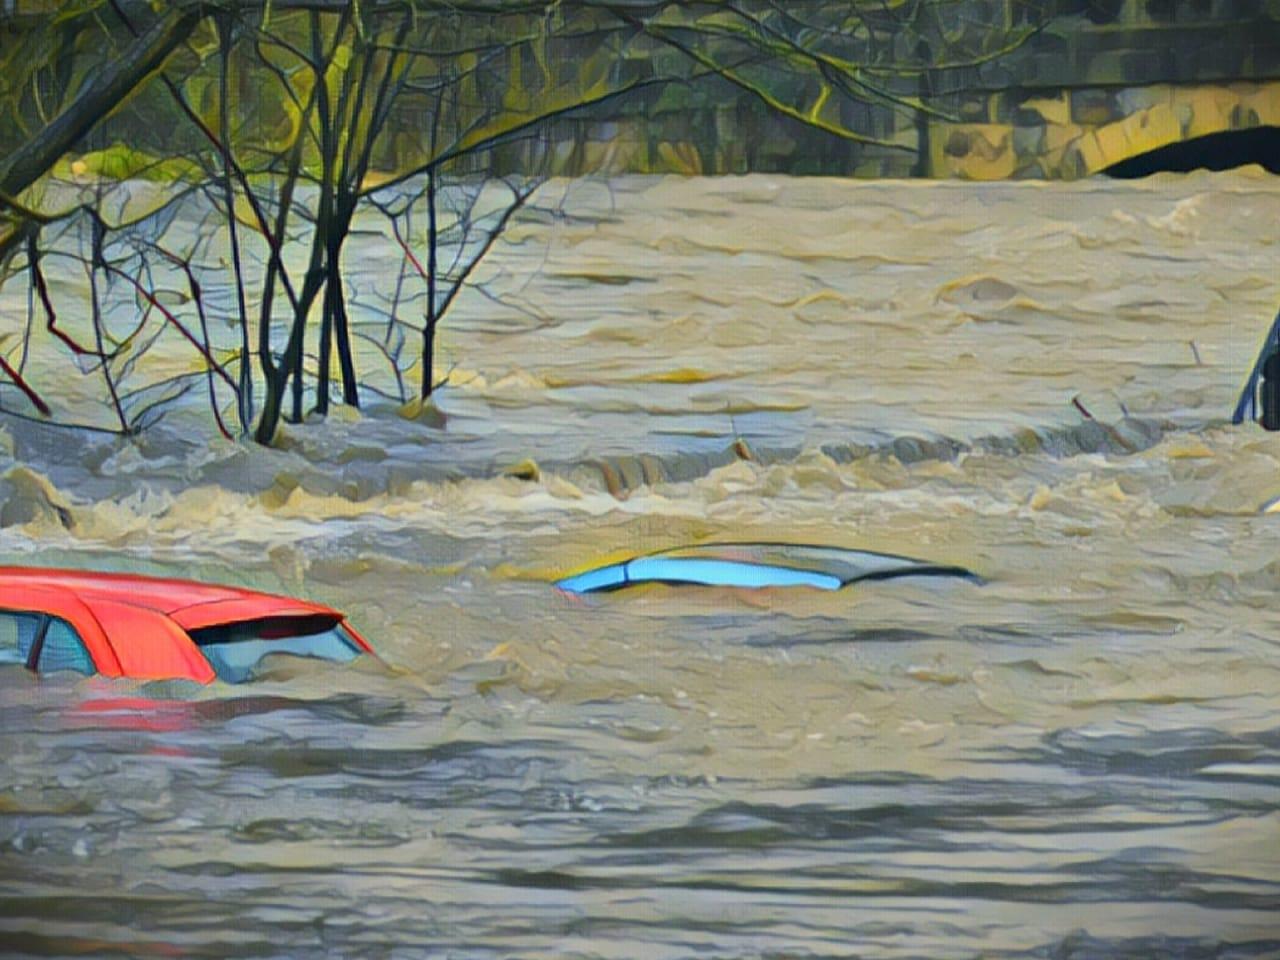 https: img.okezone.com content 2020 06 19 525 2232833 tanggul-baru-rampung-dibangun-jebol-ratusan-rumah-terendam-banjir-Oa4fDJmBFq.jpg